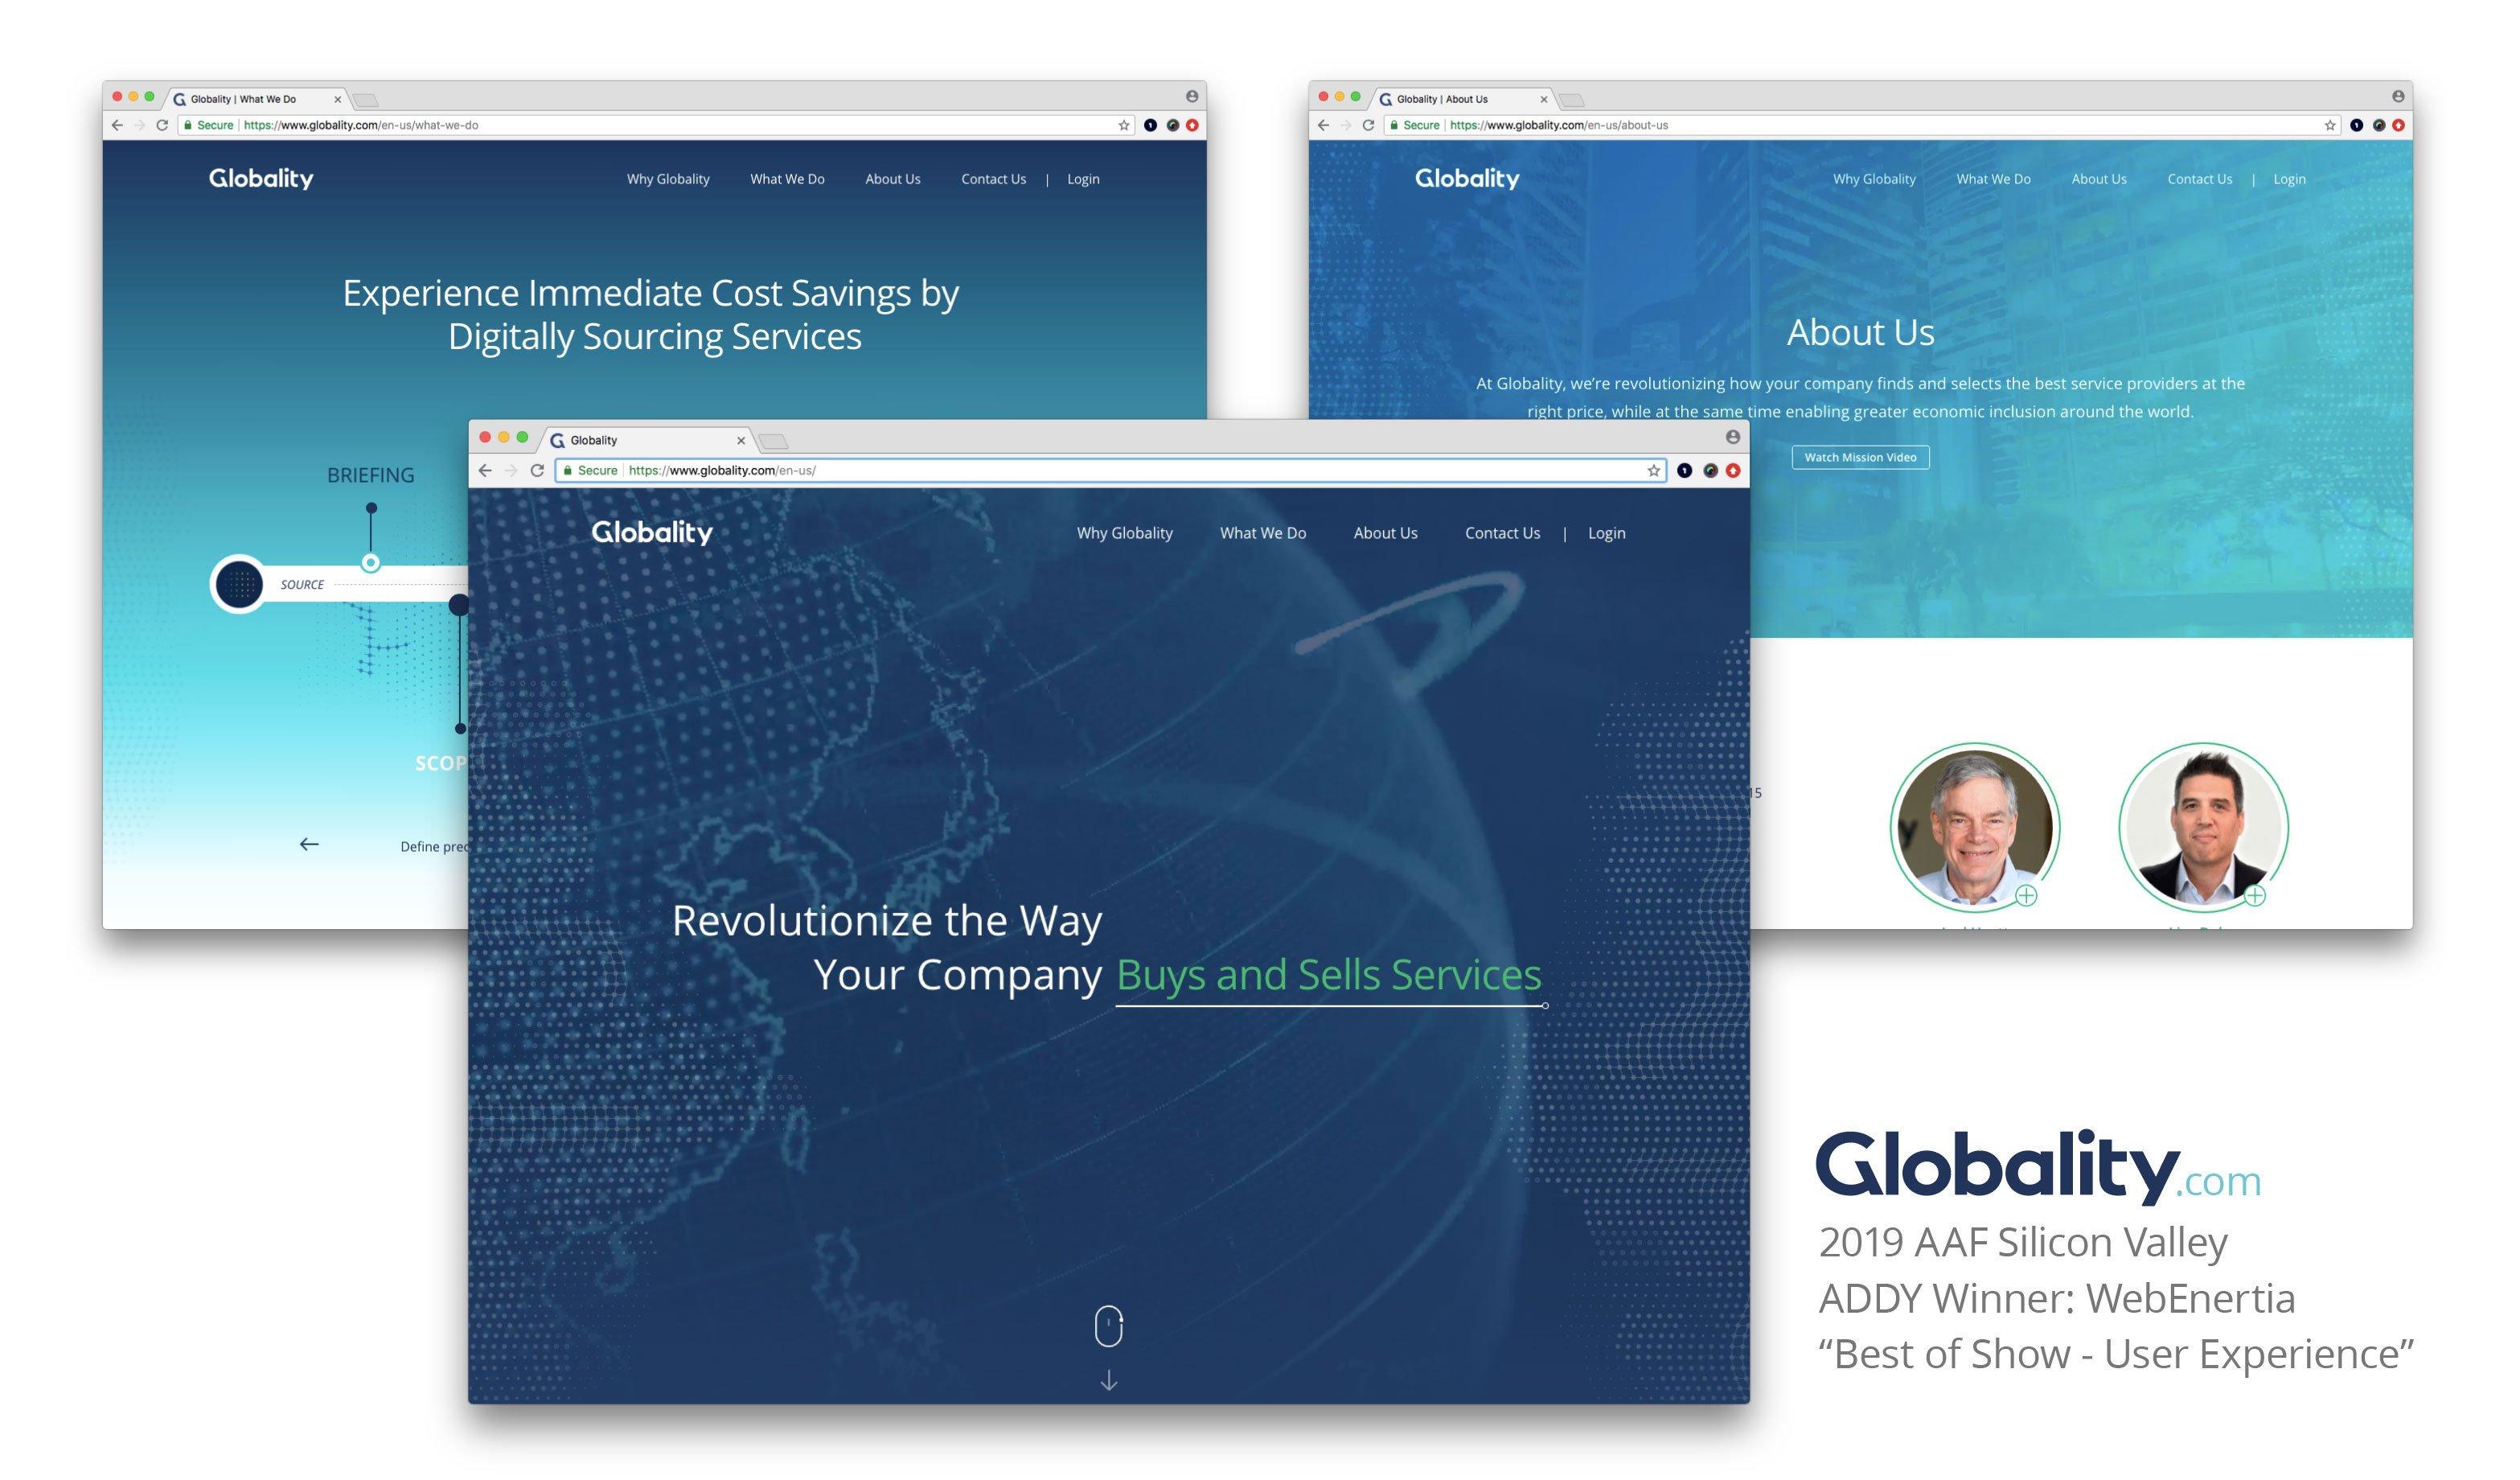 Globality.com ADDY Winner